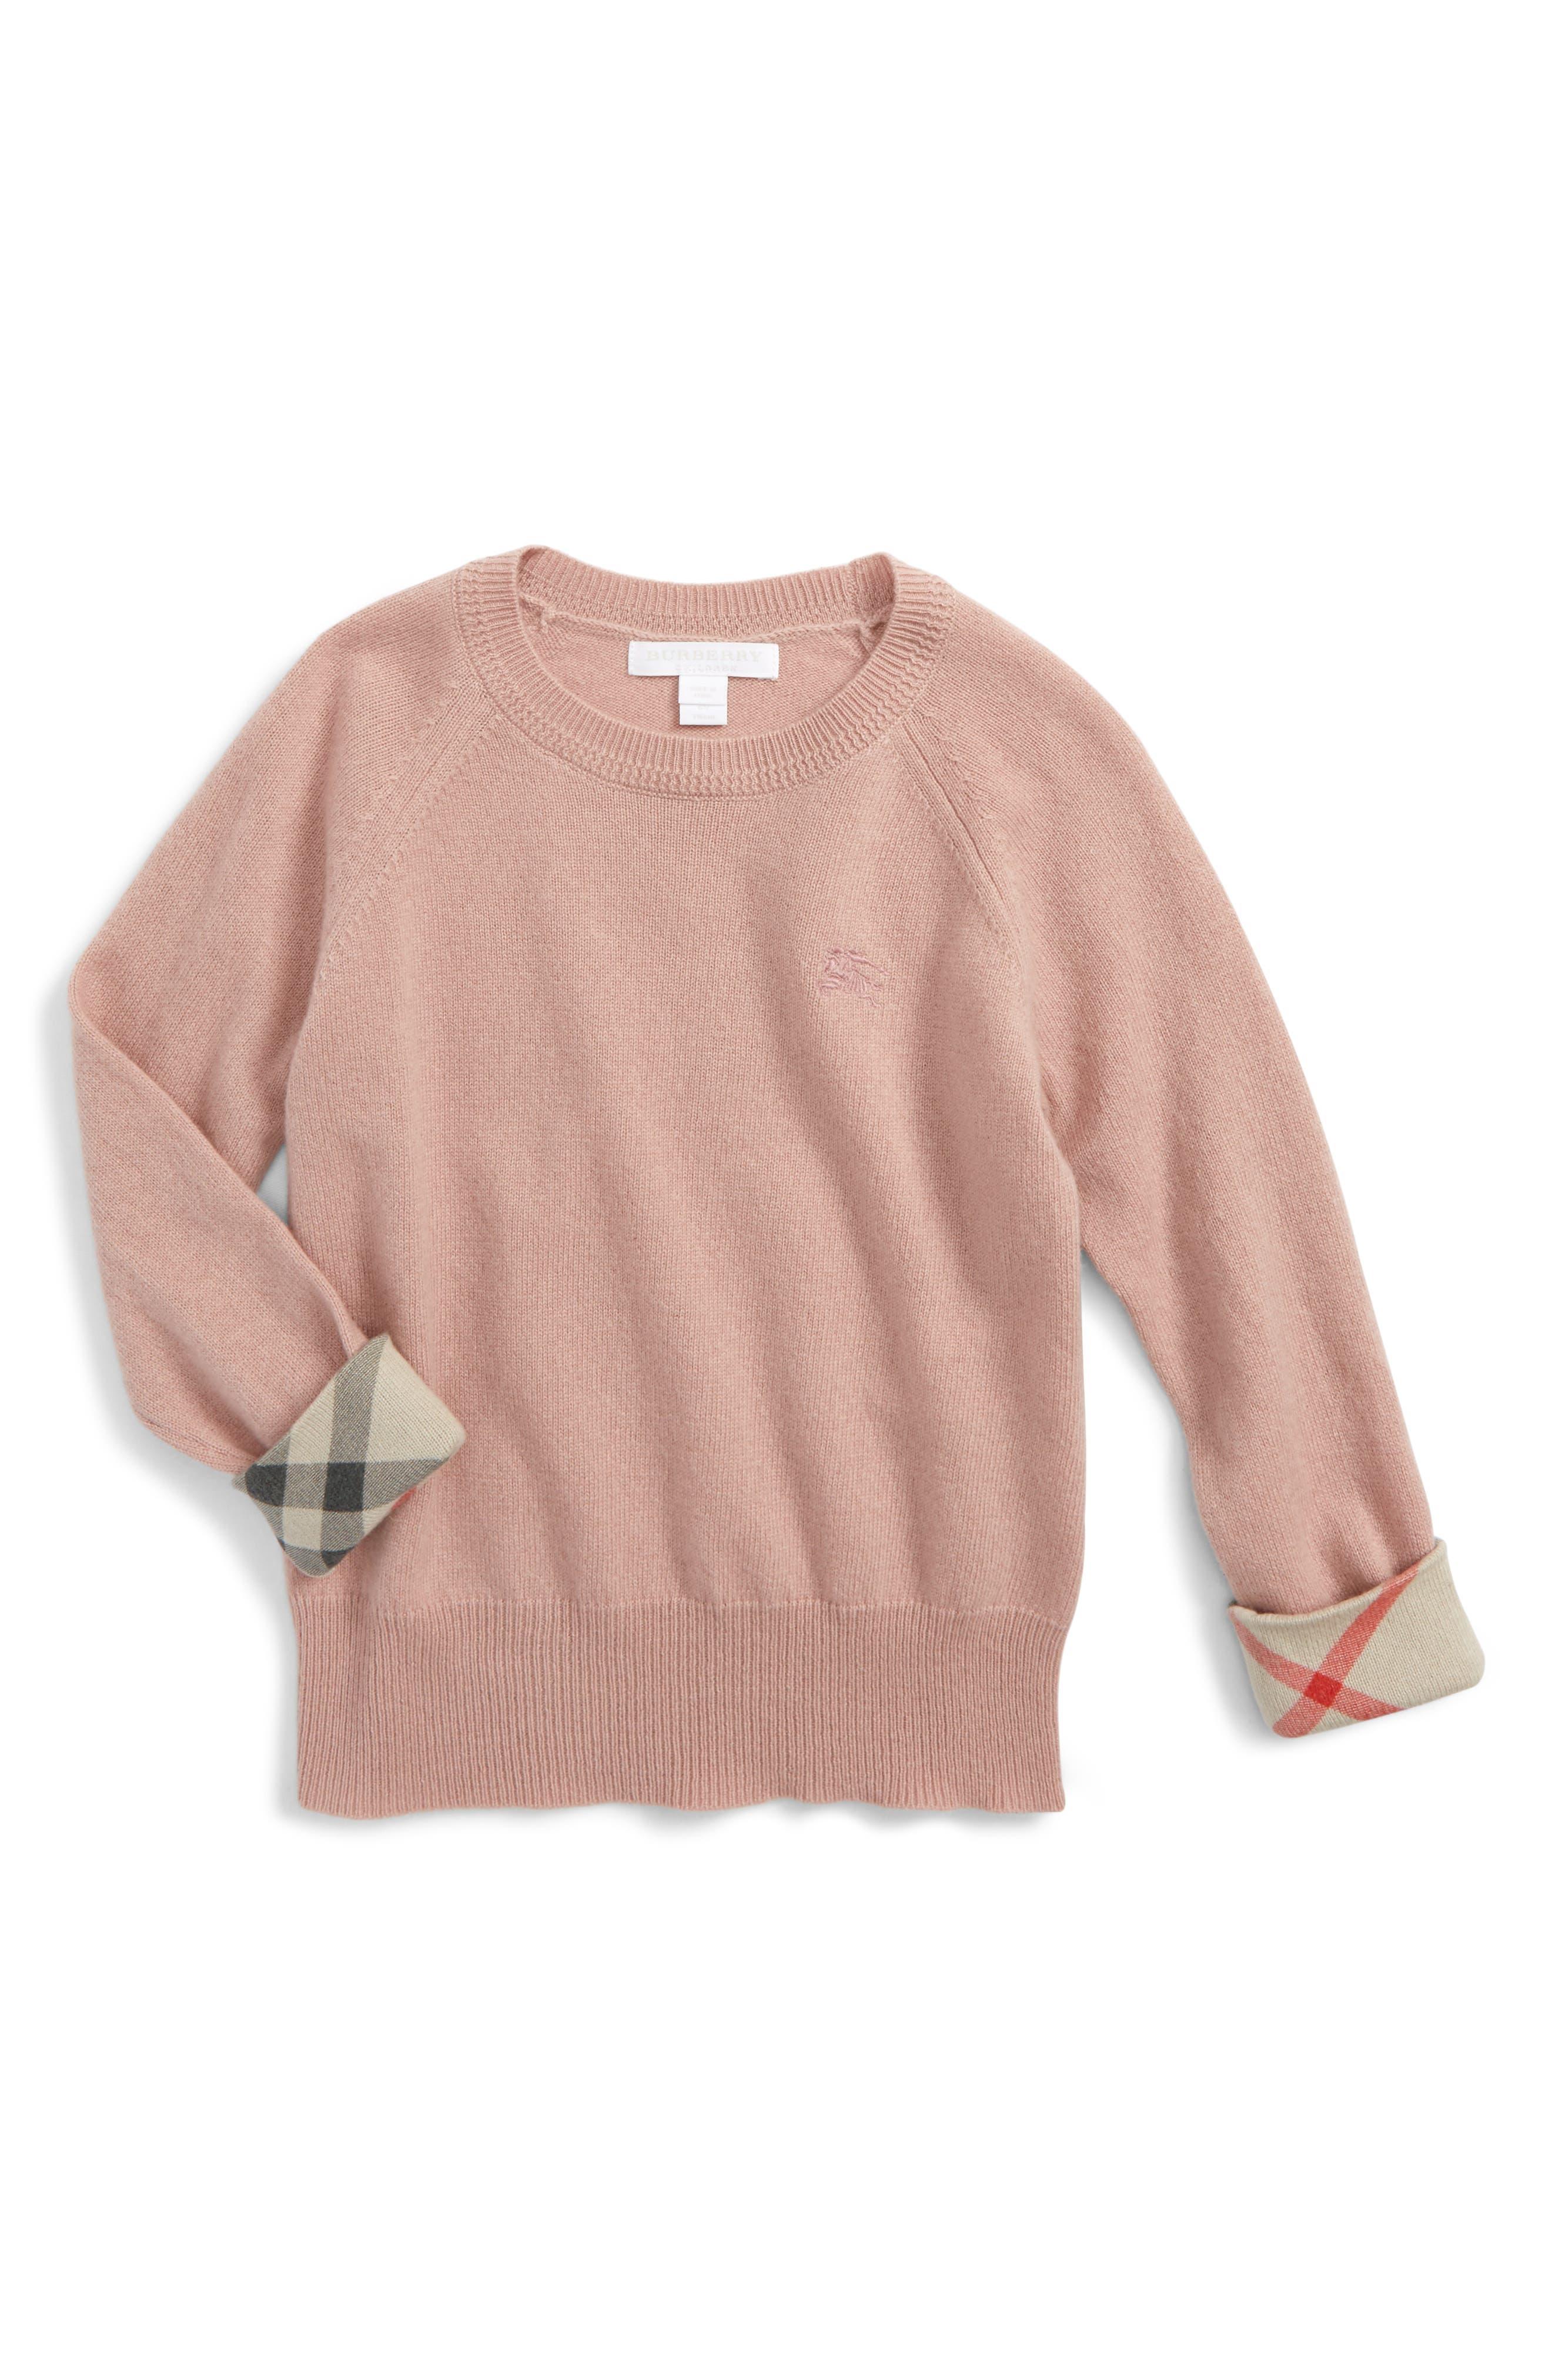 BURBERRY Georgey Cashmere Sweater